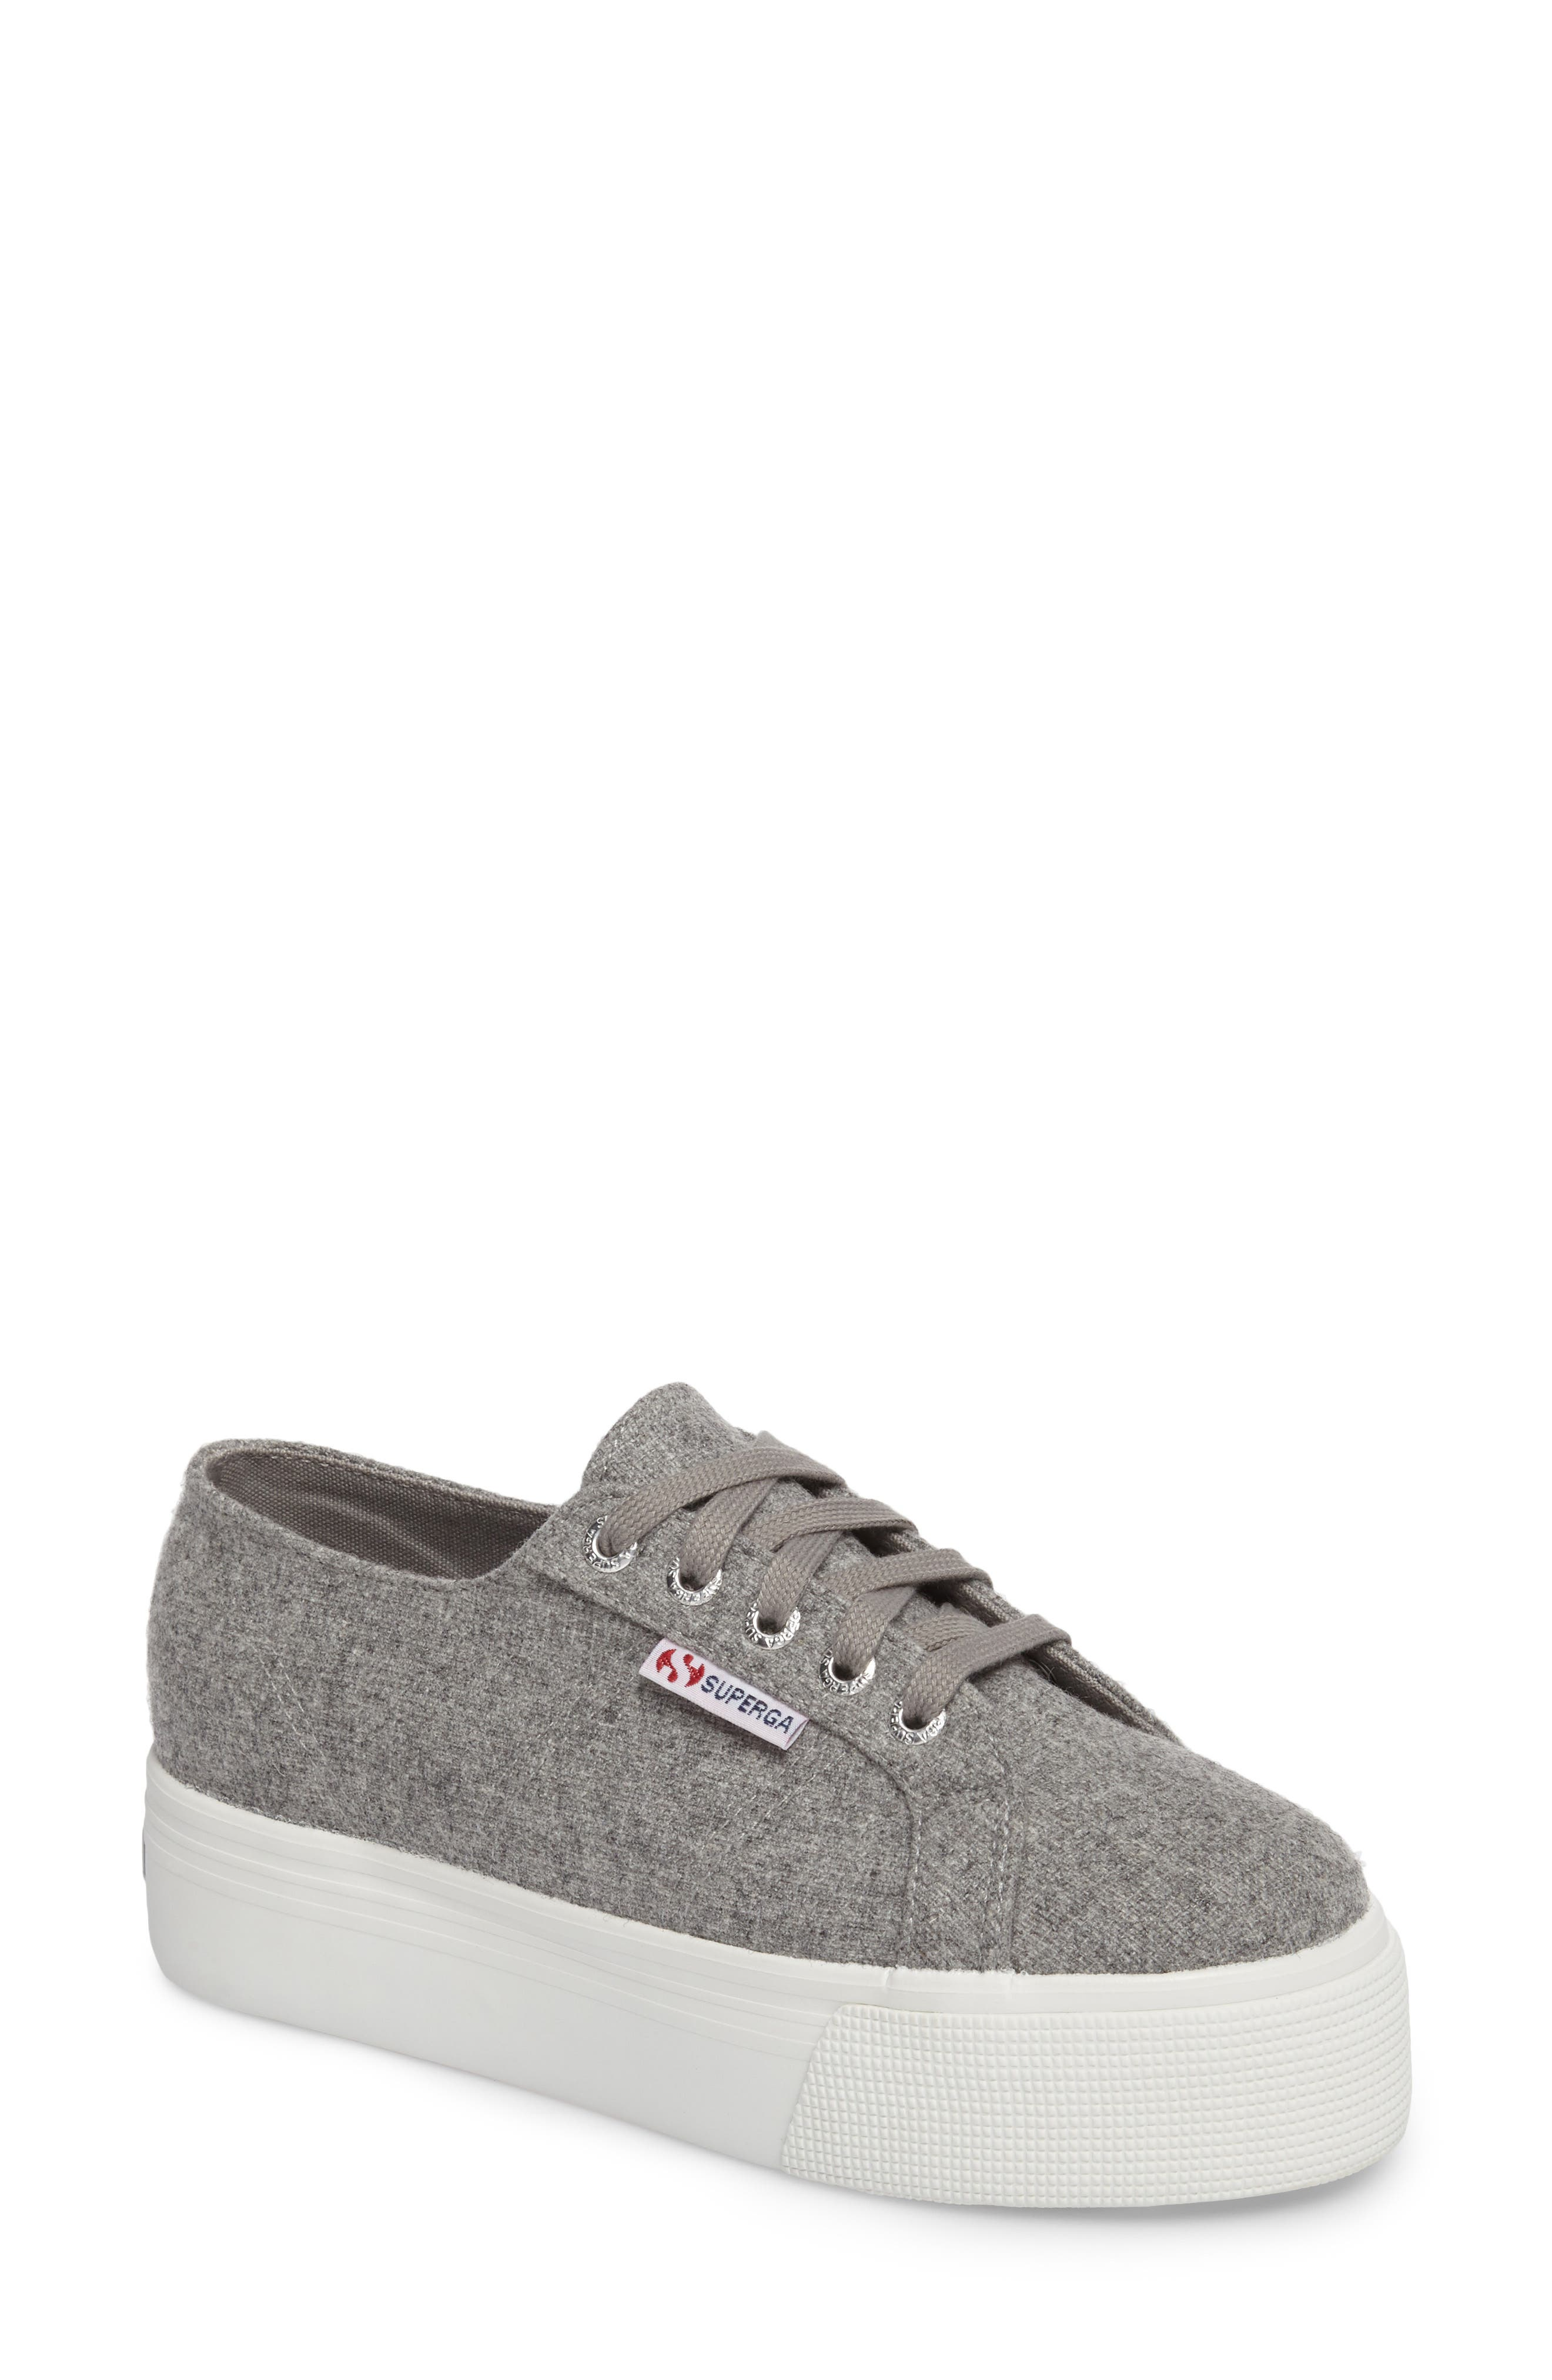 2790 Platform Sneaker,                             Main thumbnail 1, color,                             Light Grey Canvas